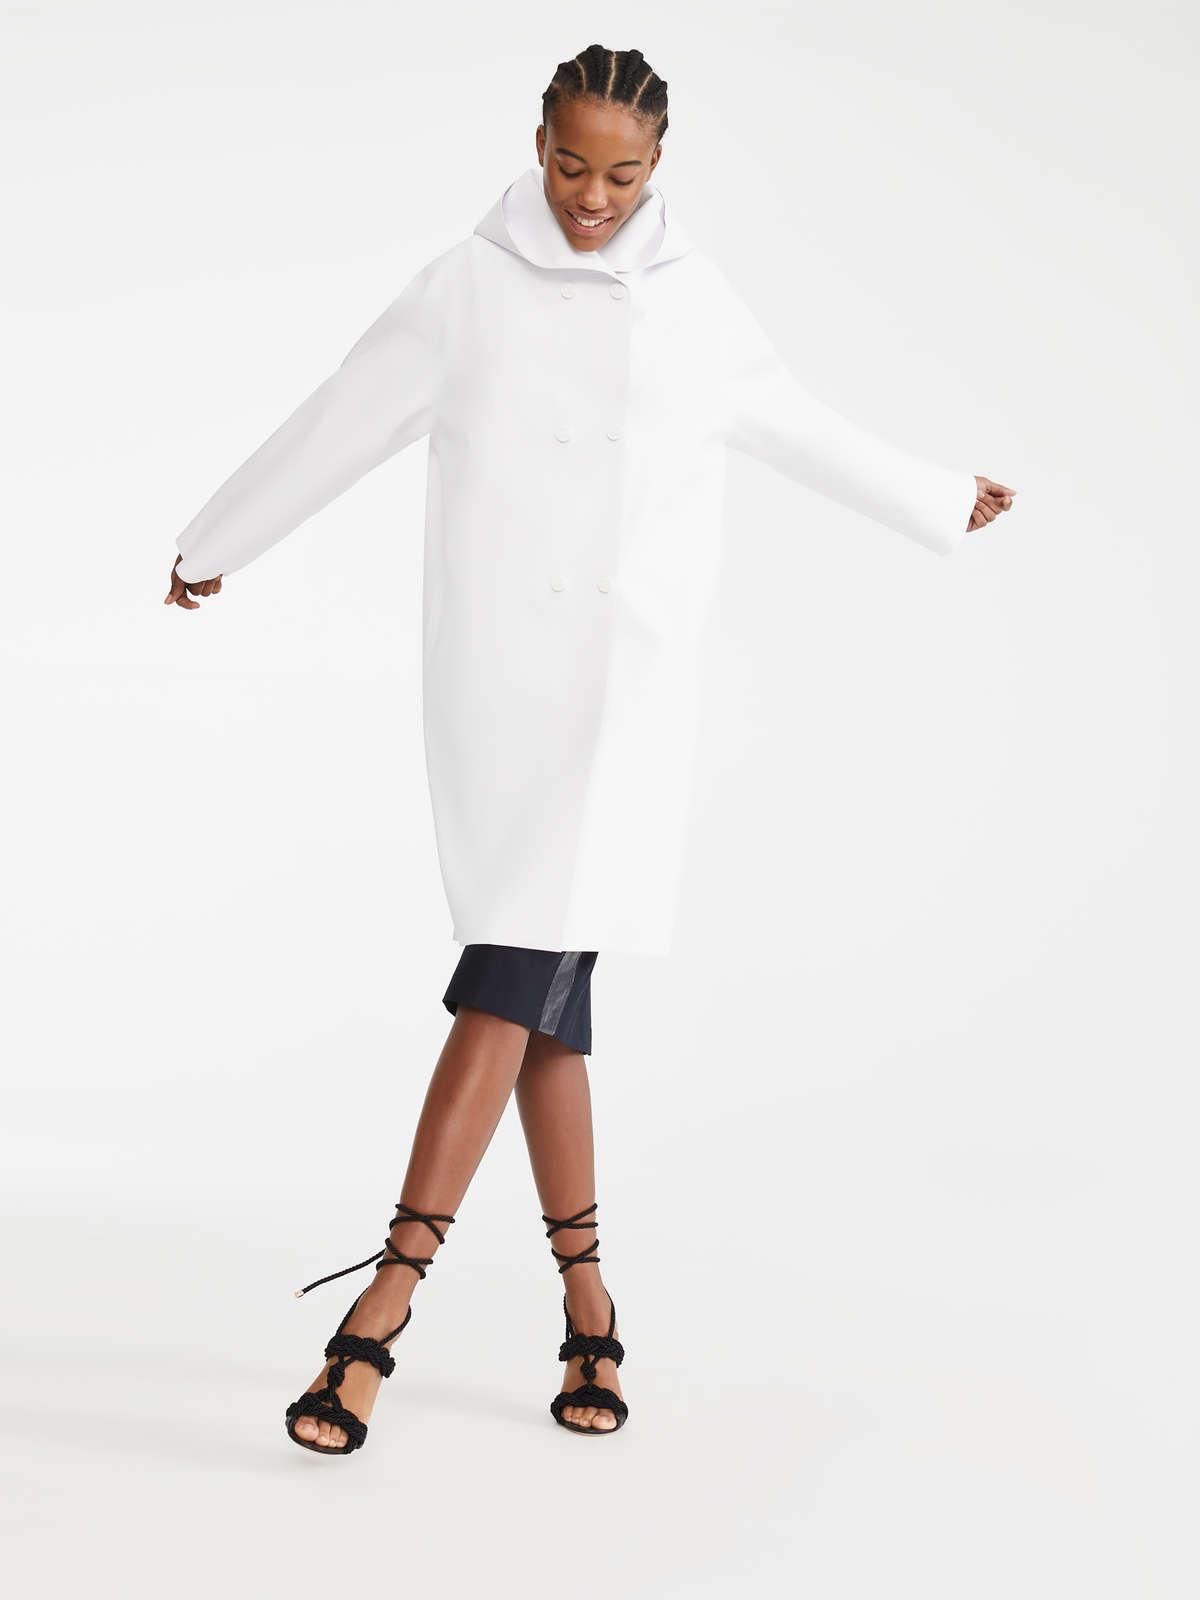 Cappotti Donna  b7af4a0189a